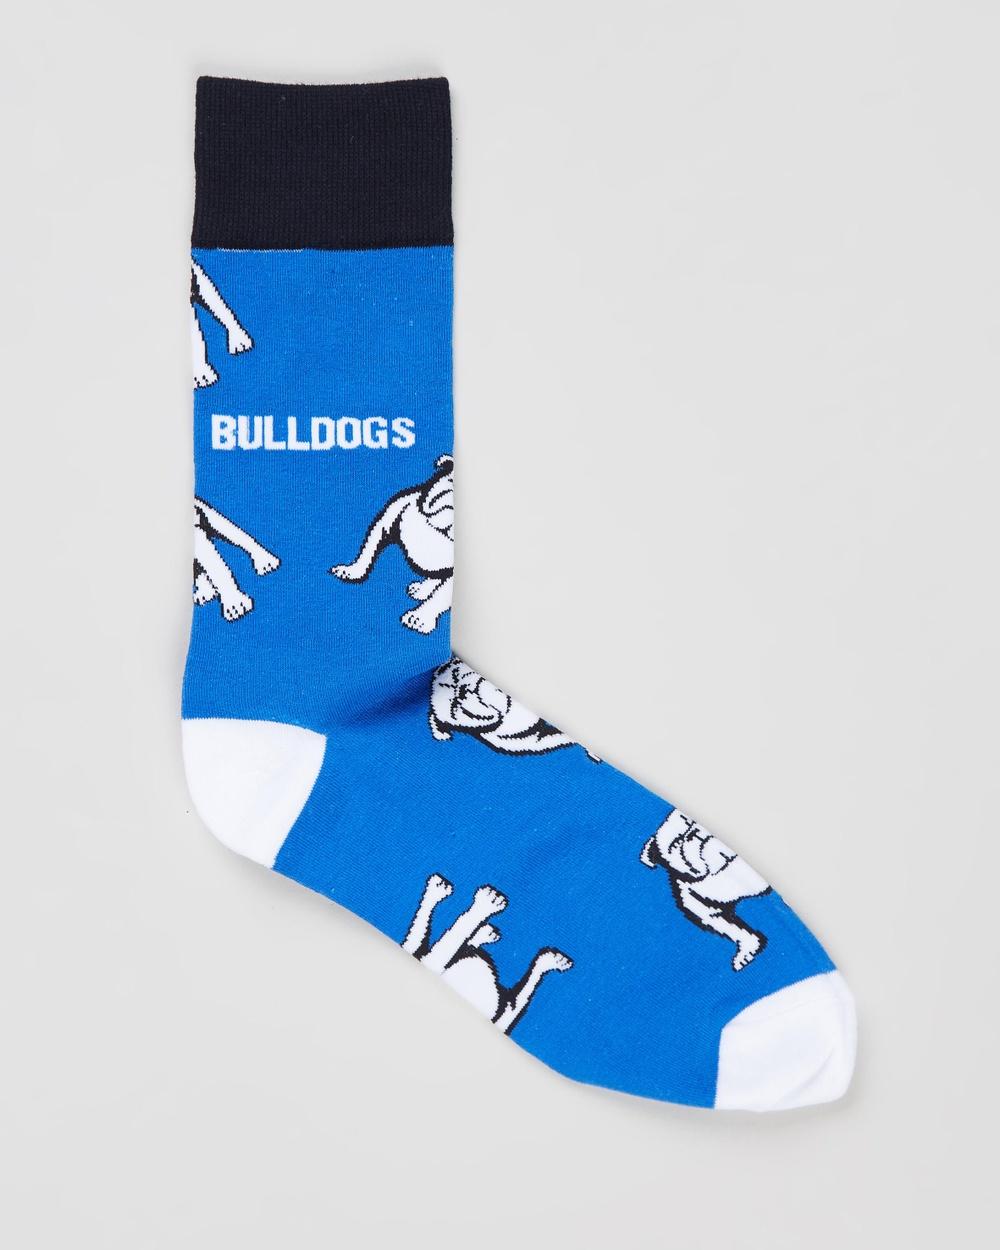 Foot-ies Canterbury Bulldogs Large Logo Socks Accessories Blue & White